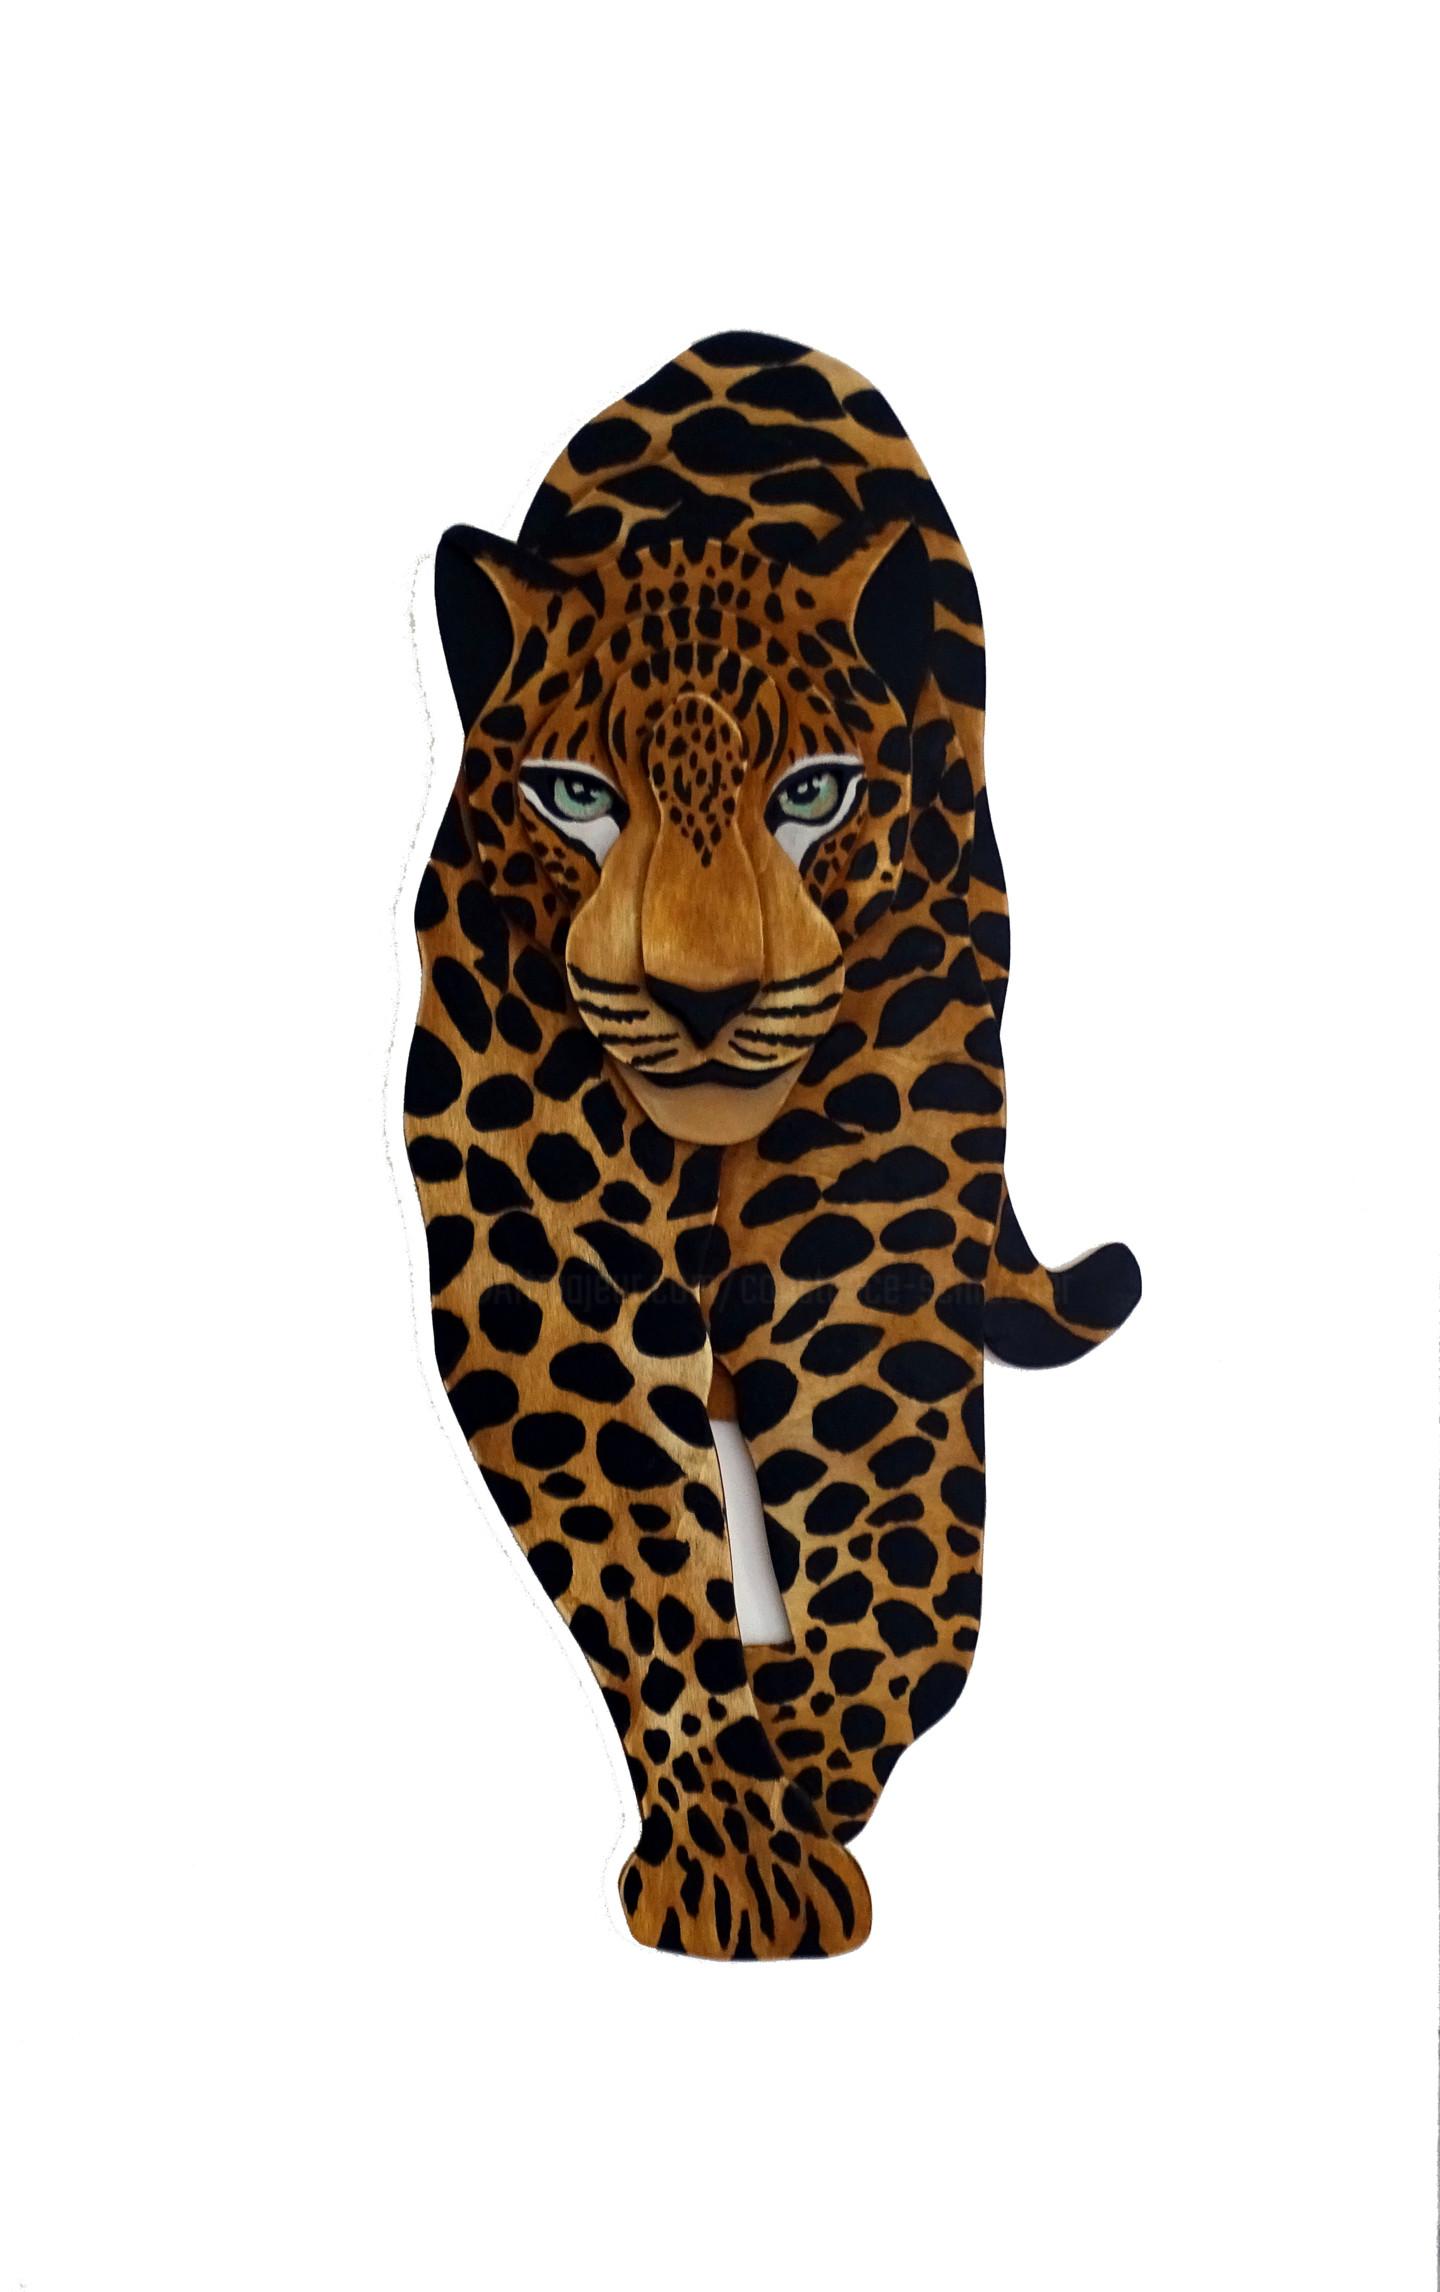 Constance Schroeder - anima jaguar